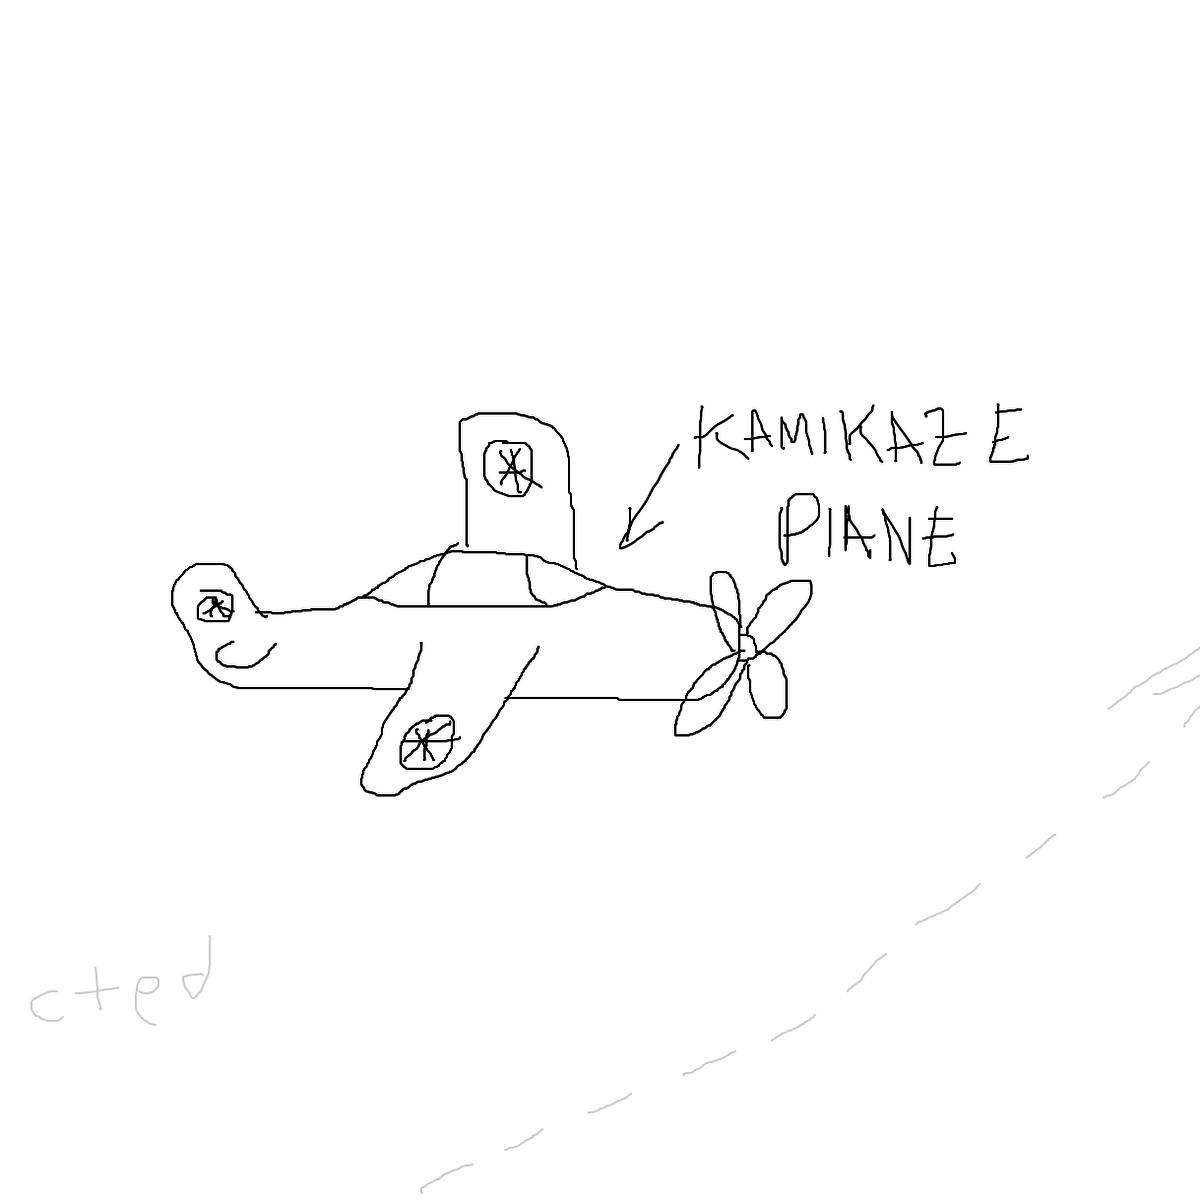 BAAAM drawing#5554 lat:21.7800064086914060lng: -160.2041931152343800